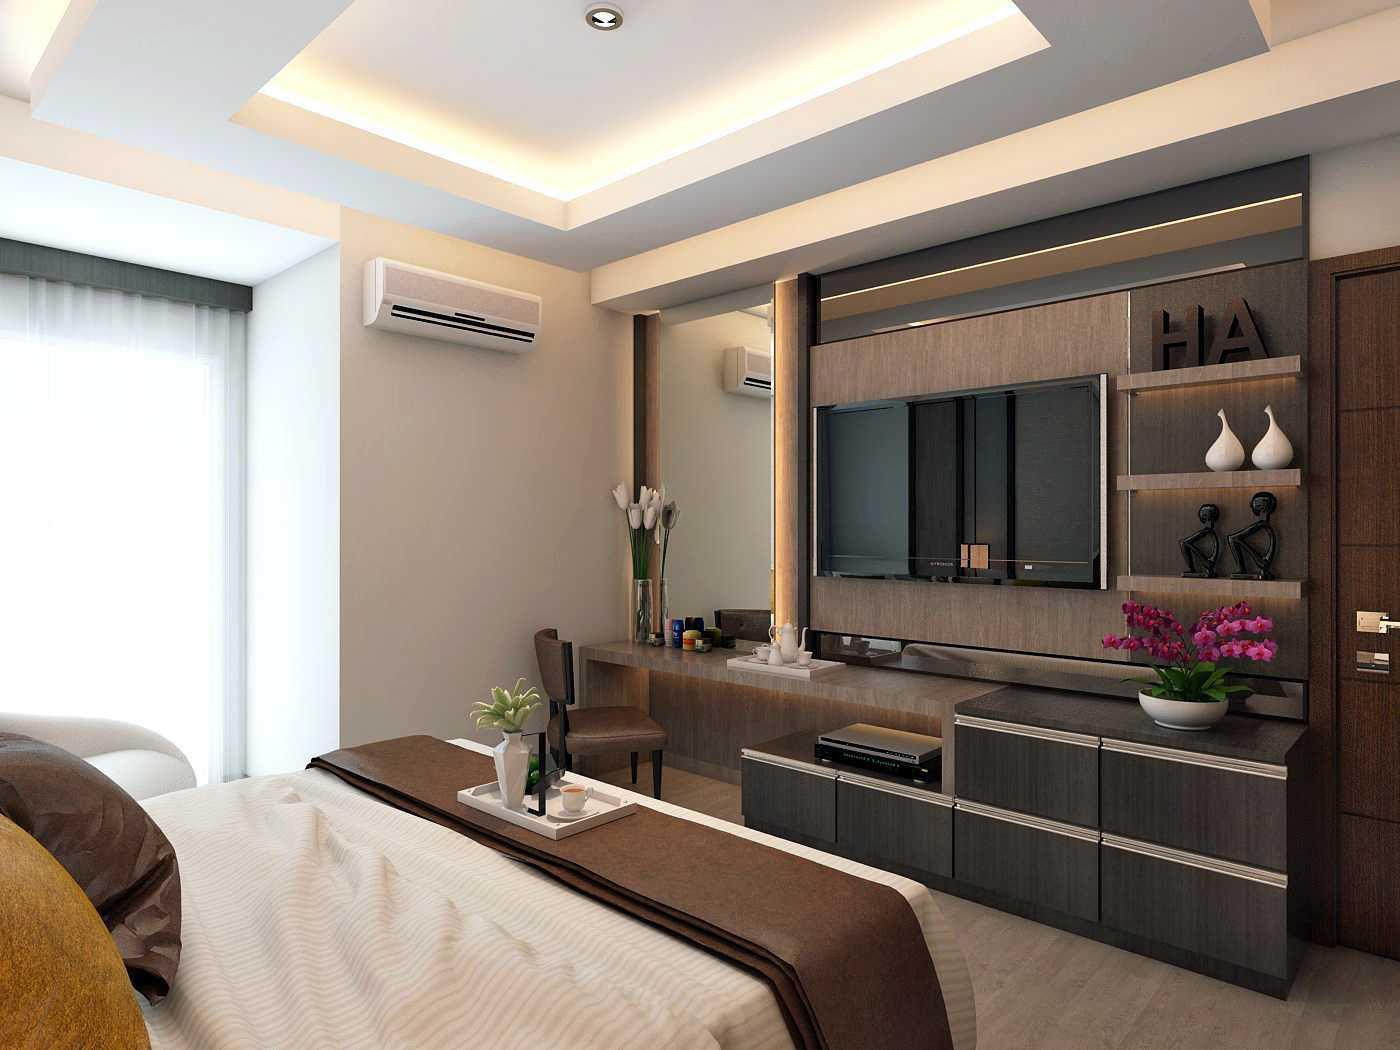 Habibullah Alfatih Condominium - Greenbay Pluit Jakarta, Indonesia Jakarta, Indonesia Master-Bedroom-5 Kontemporer 35911